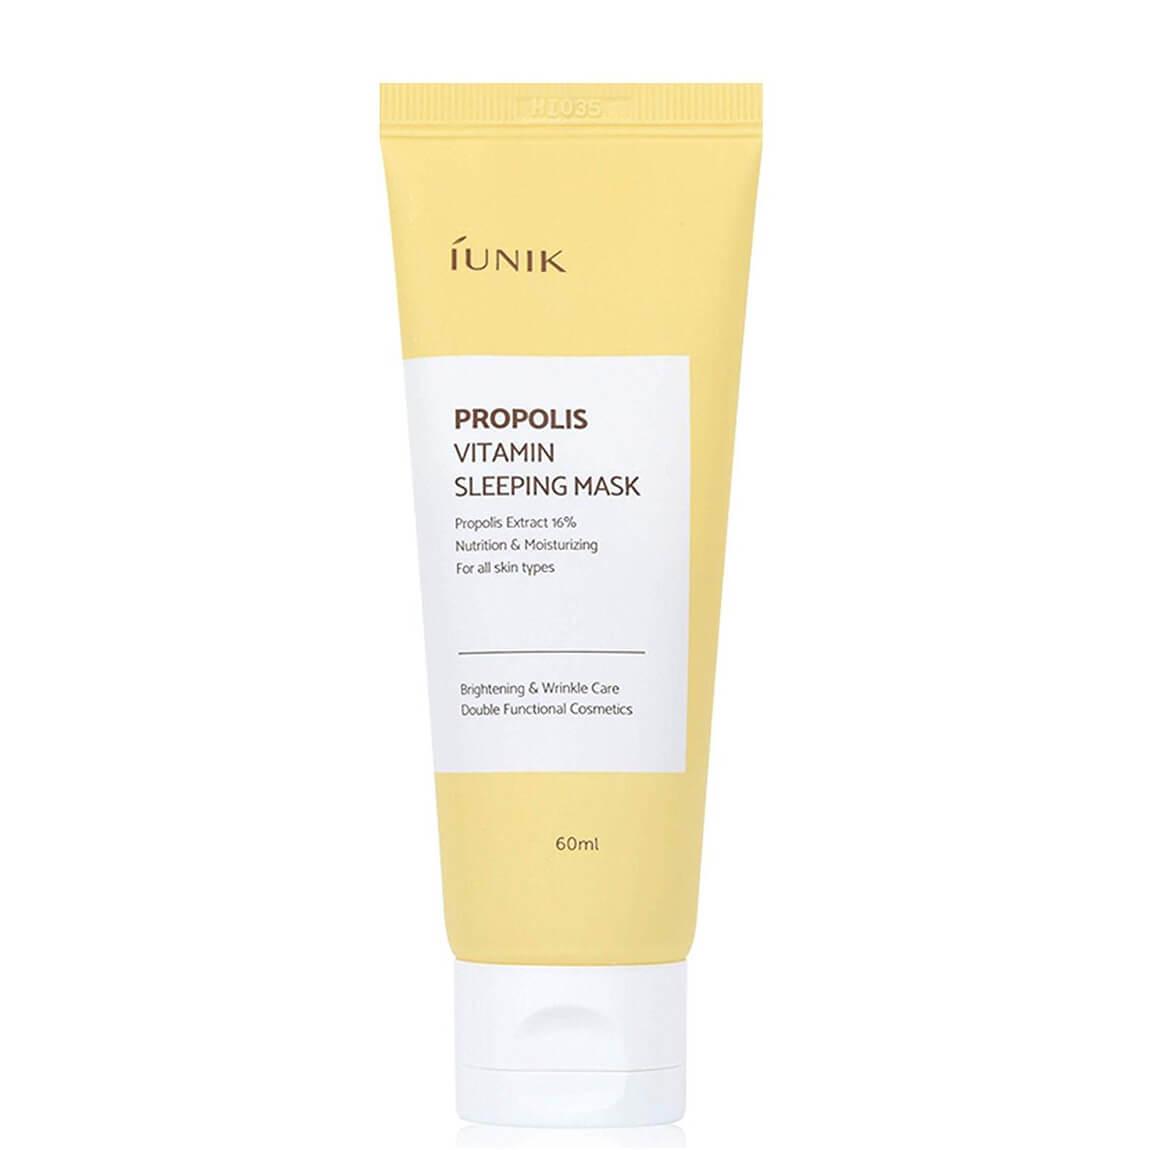 iUNIK - Propolis Vitamin Sleeping Mask 60ml